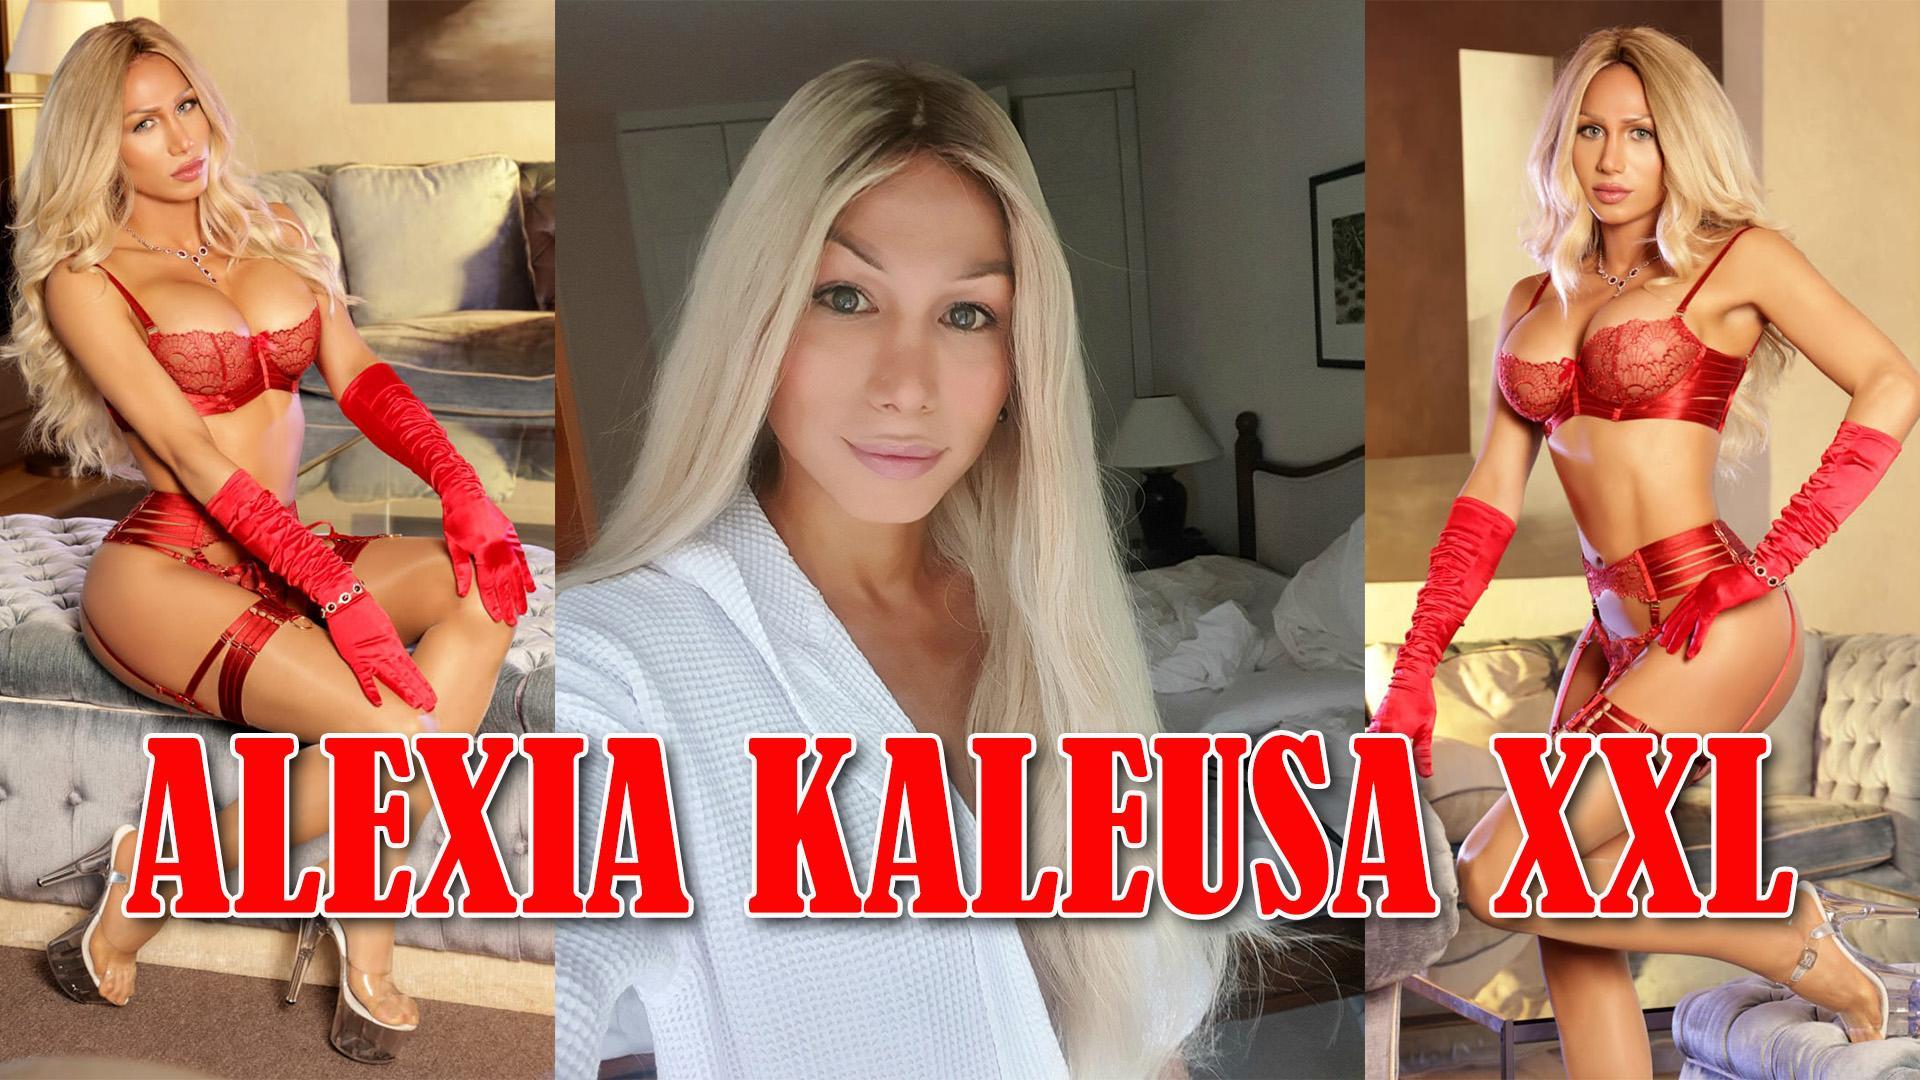 Alexia Karleusa XXL Shemale in Berlin